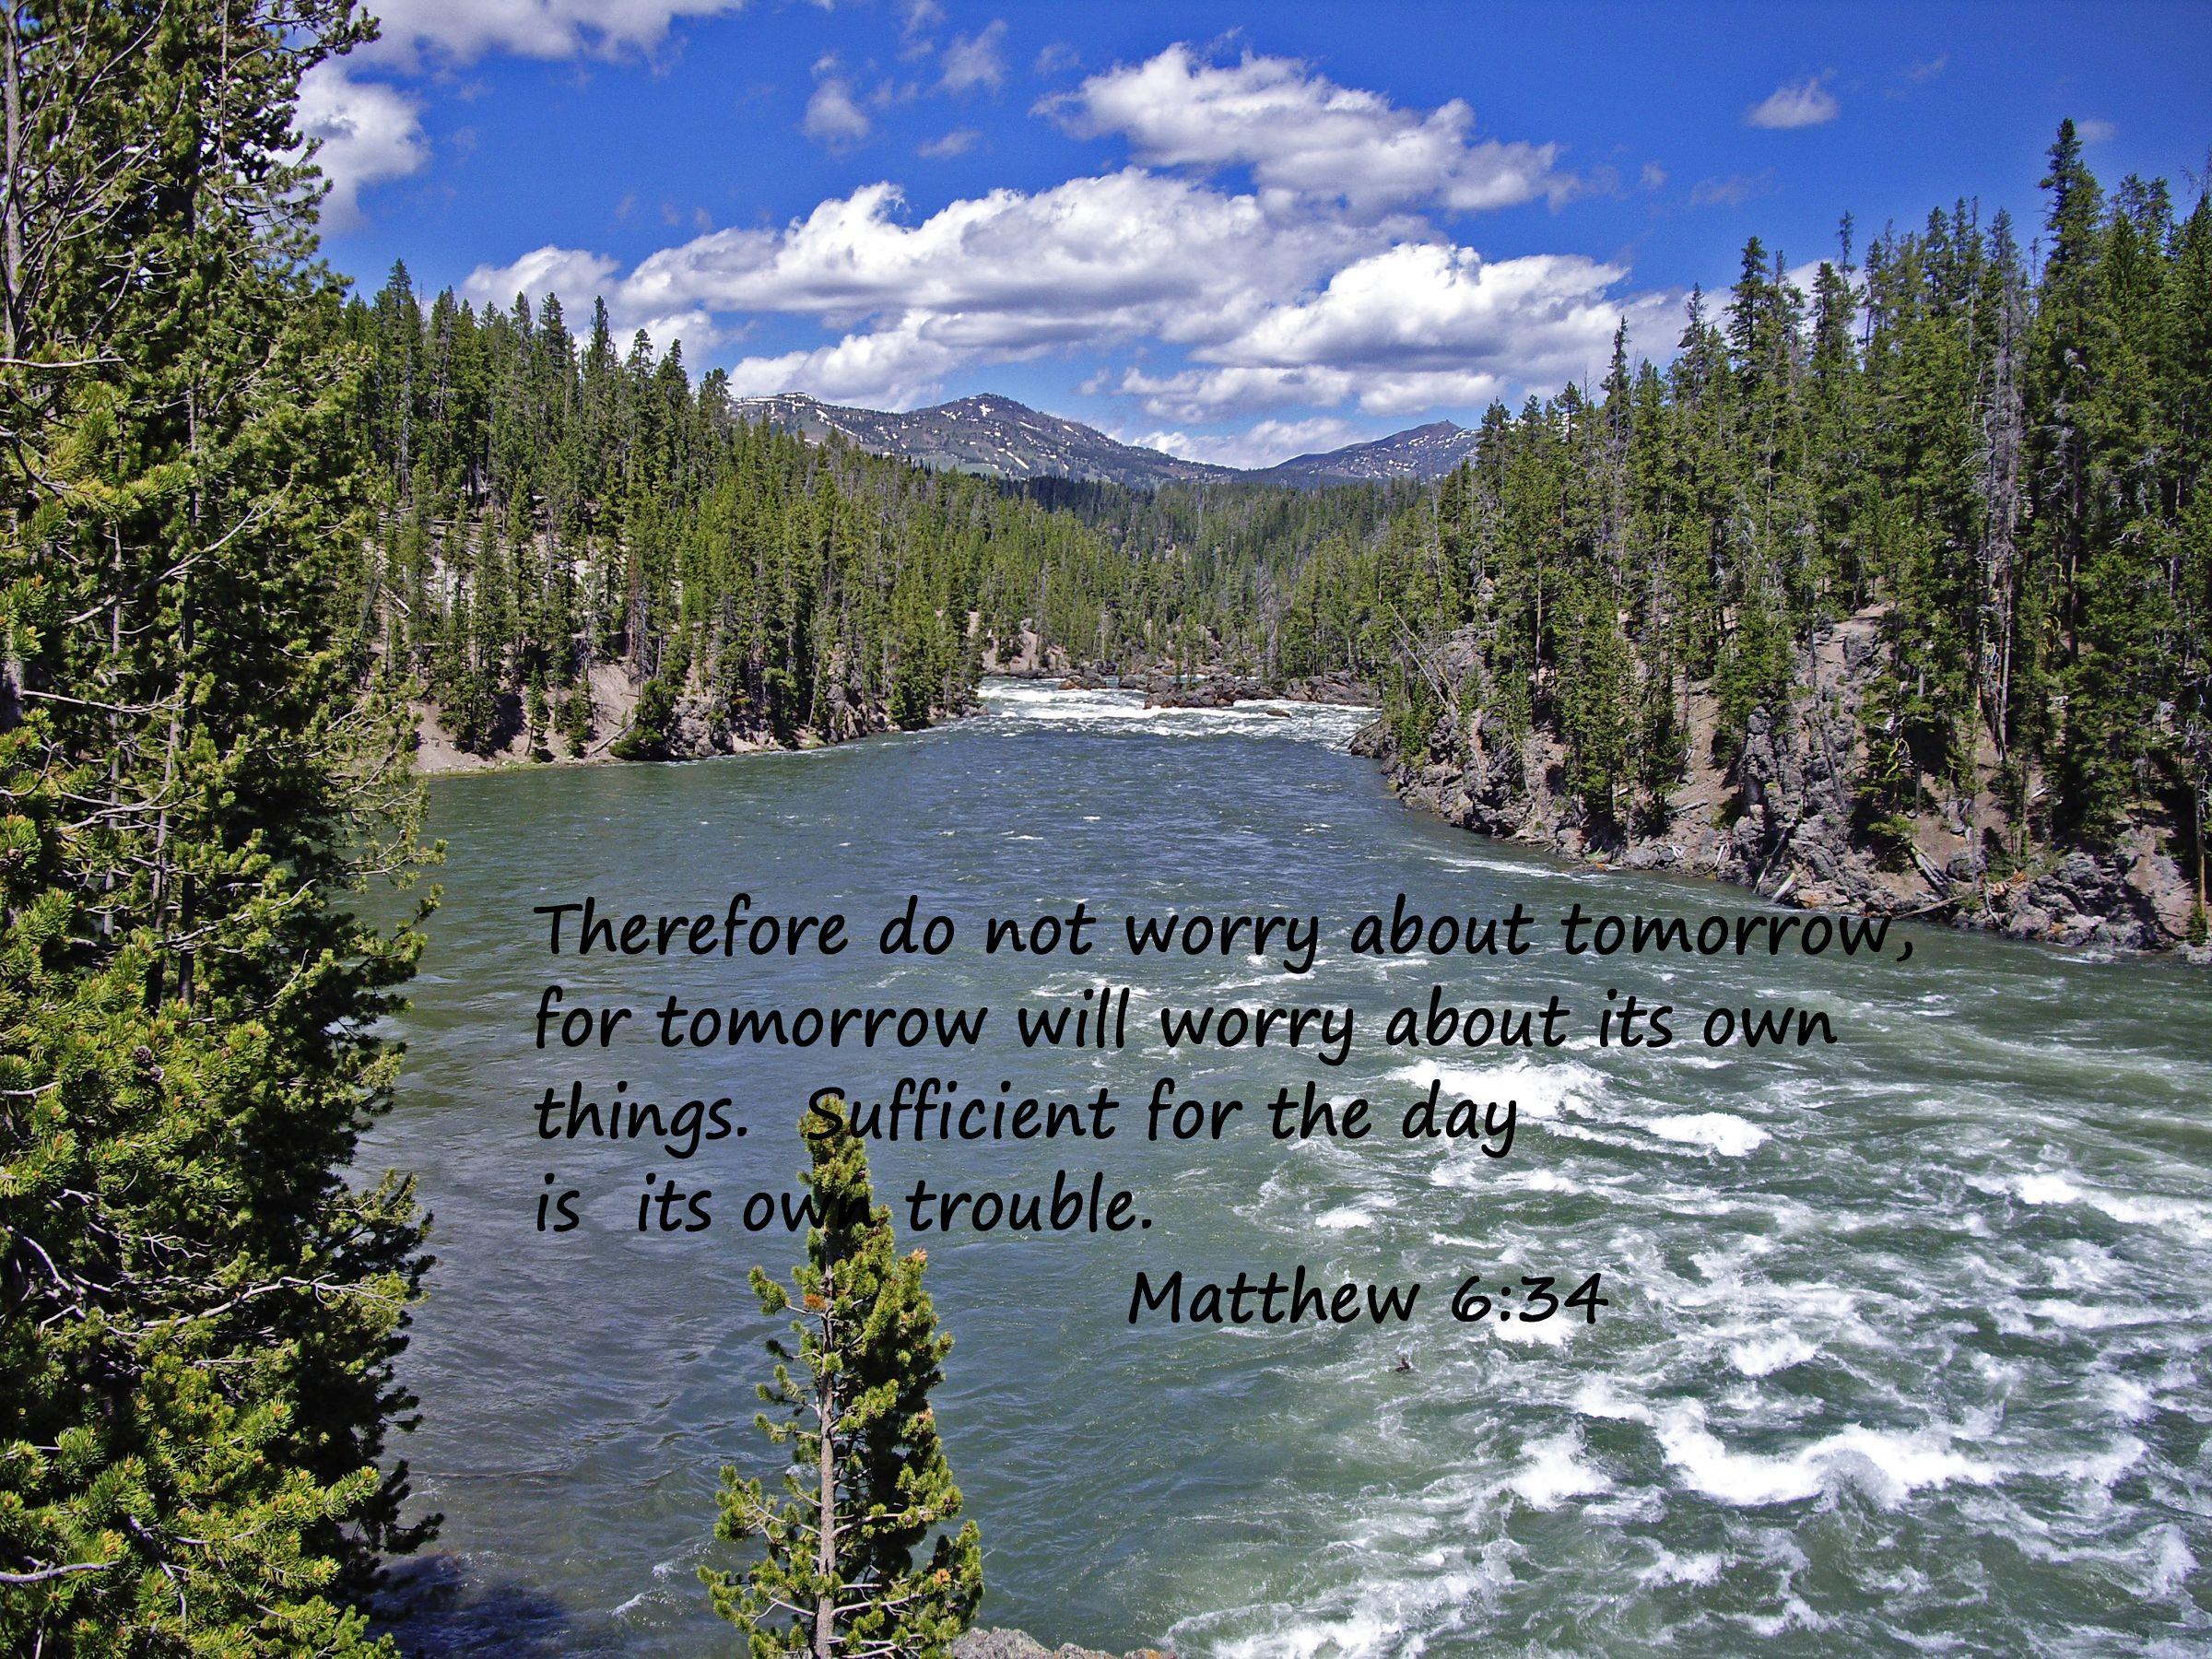 Beautiful Montana Mountain River With Bible Scripture Verse